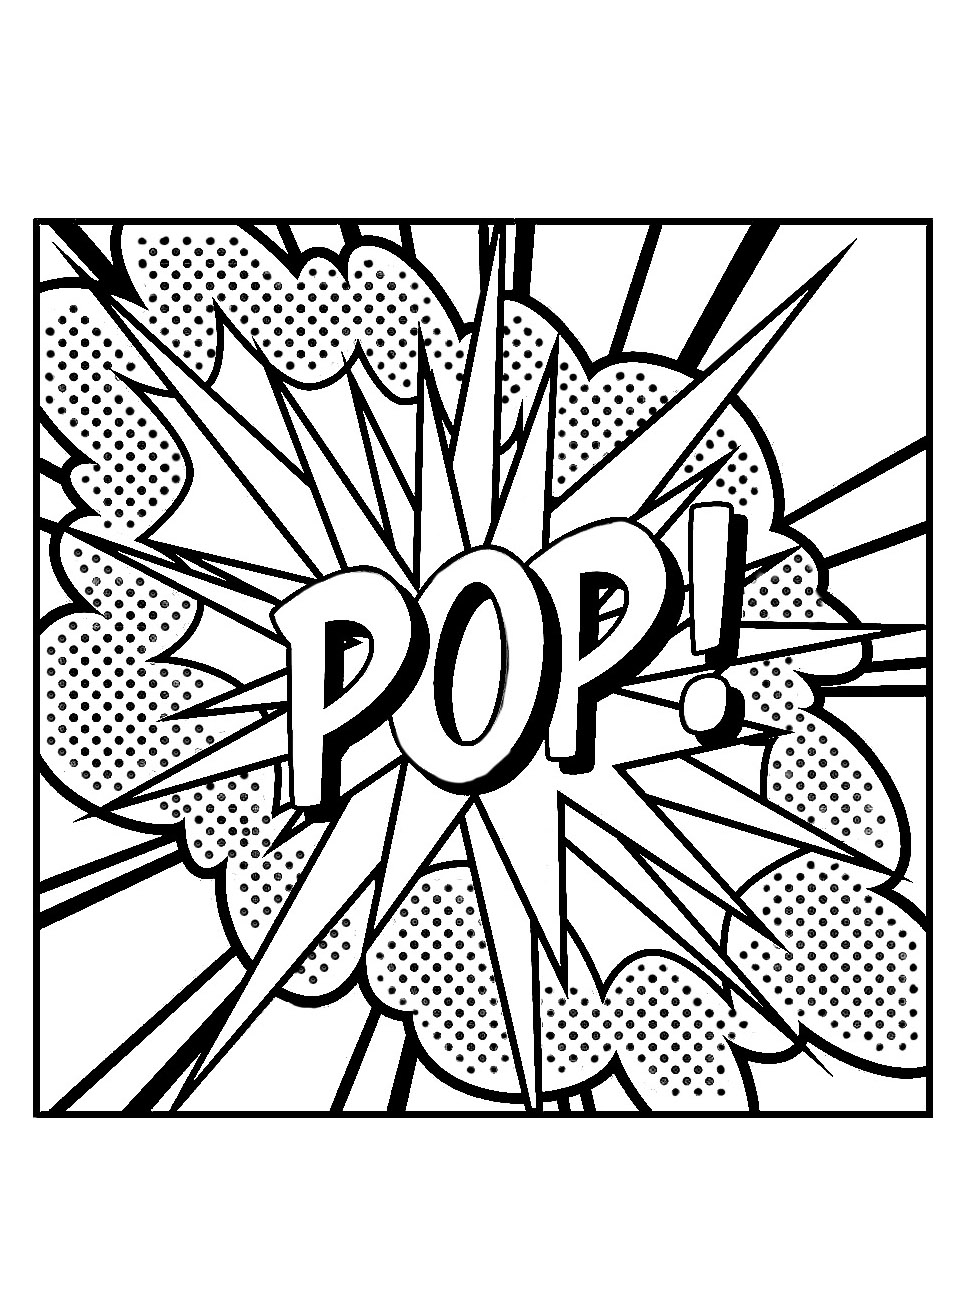 Malbuch Fur Erwachsene  : Pop art - 20